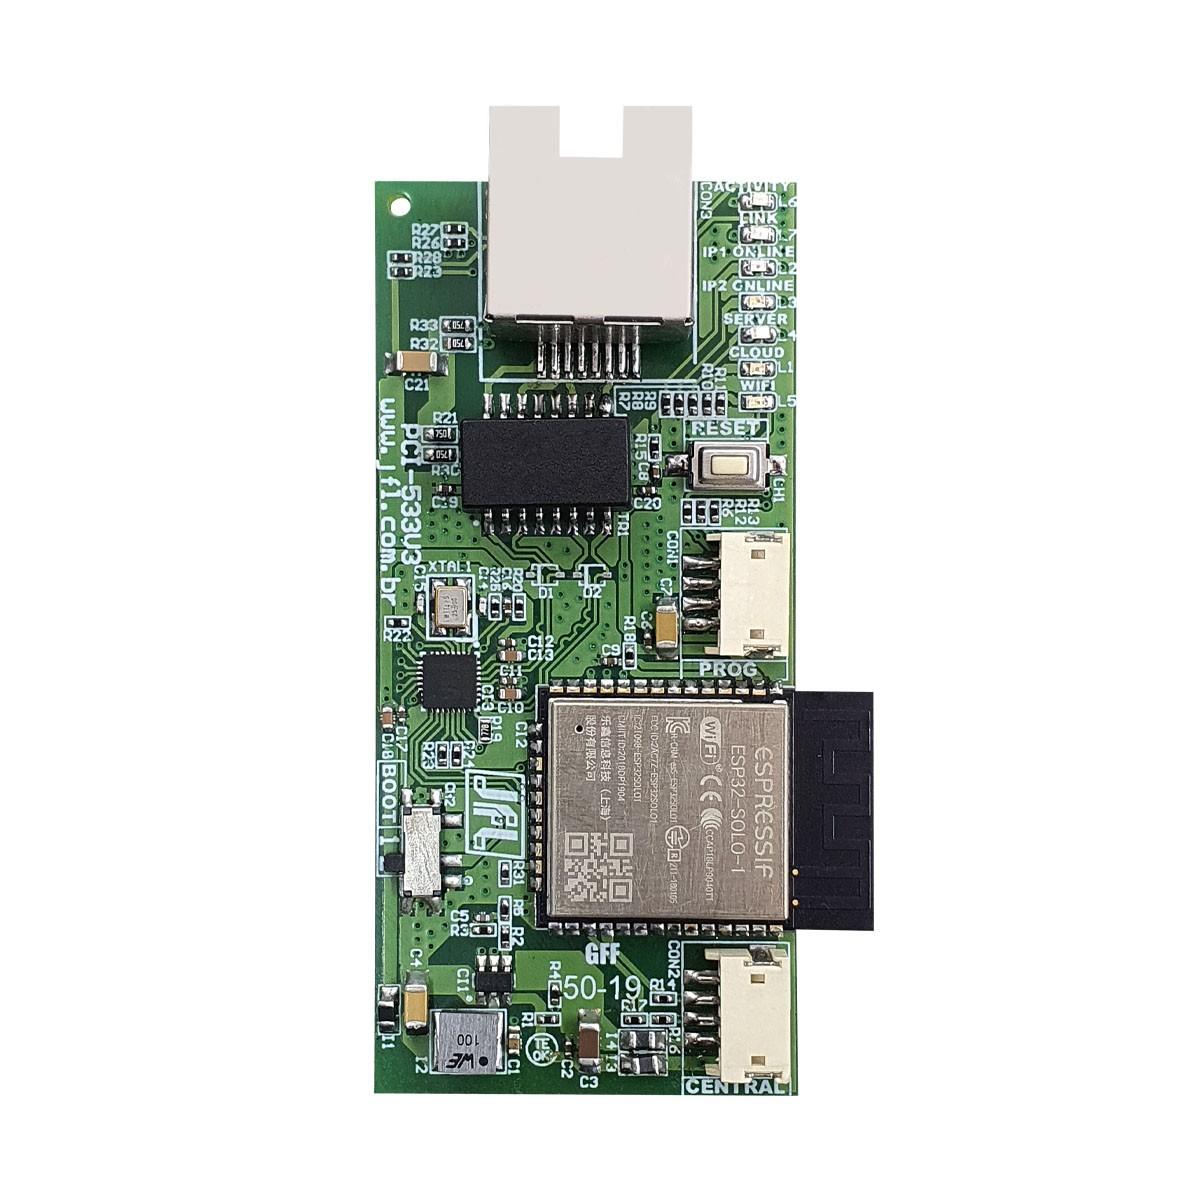 Kit Alarme SmartCloud 18 Jfl Sensores Sem Fio Shc Fit